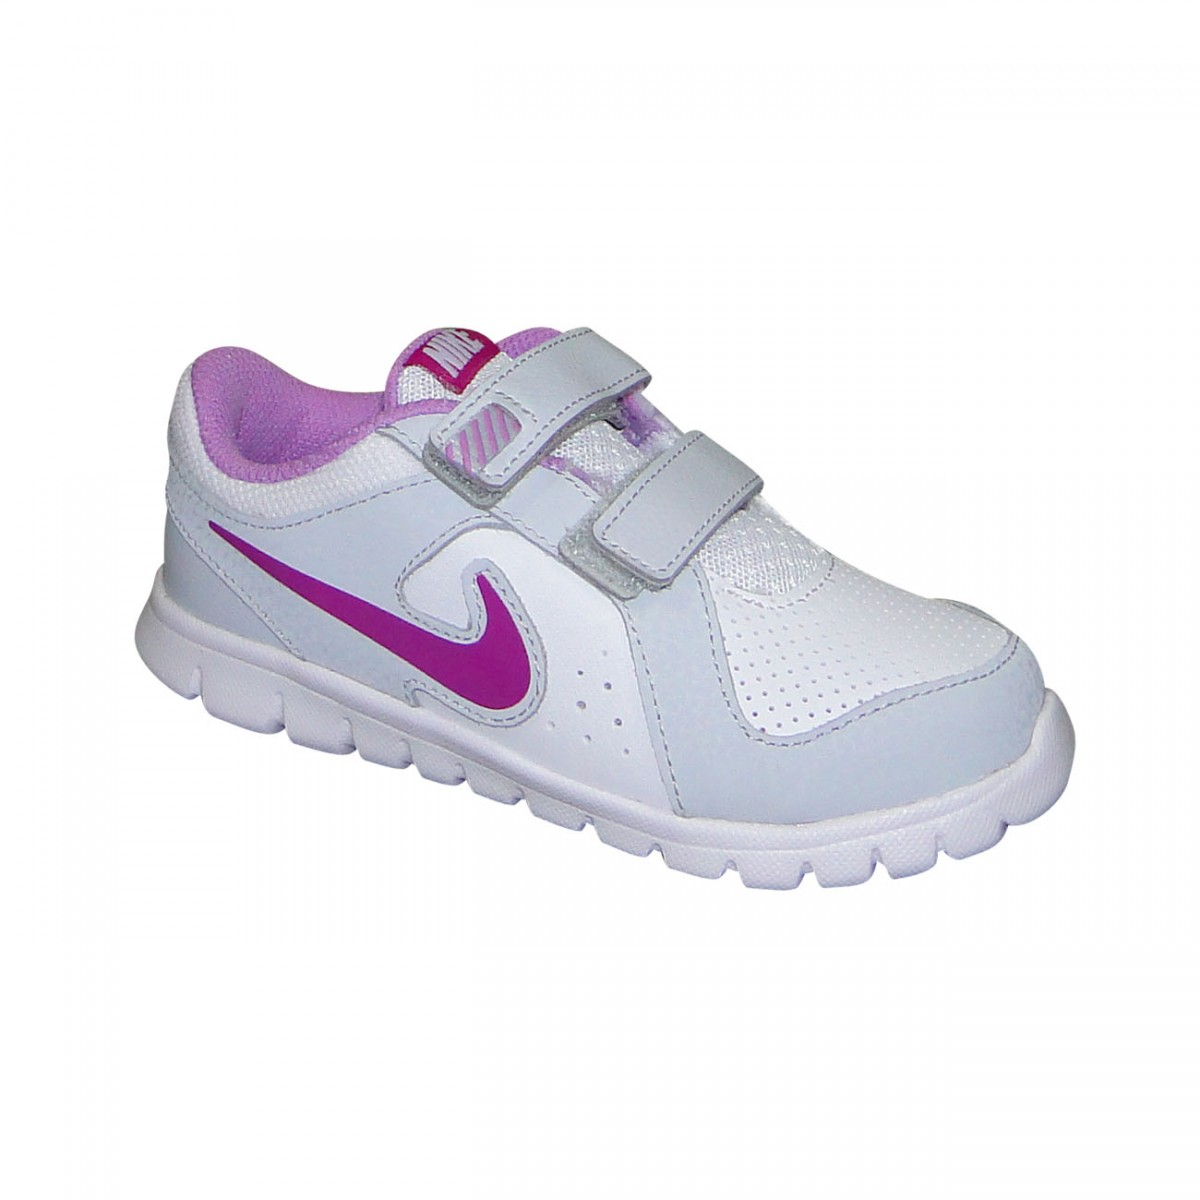 36e0a5cc528 Tenis Nike Flex Experience Ltr Infantil 631467-103 - GELO UVA - Chuteira  Nike